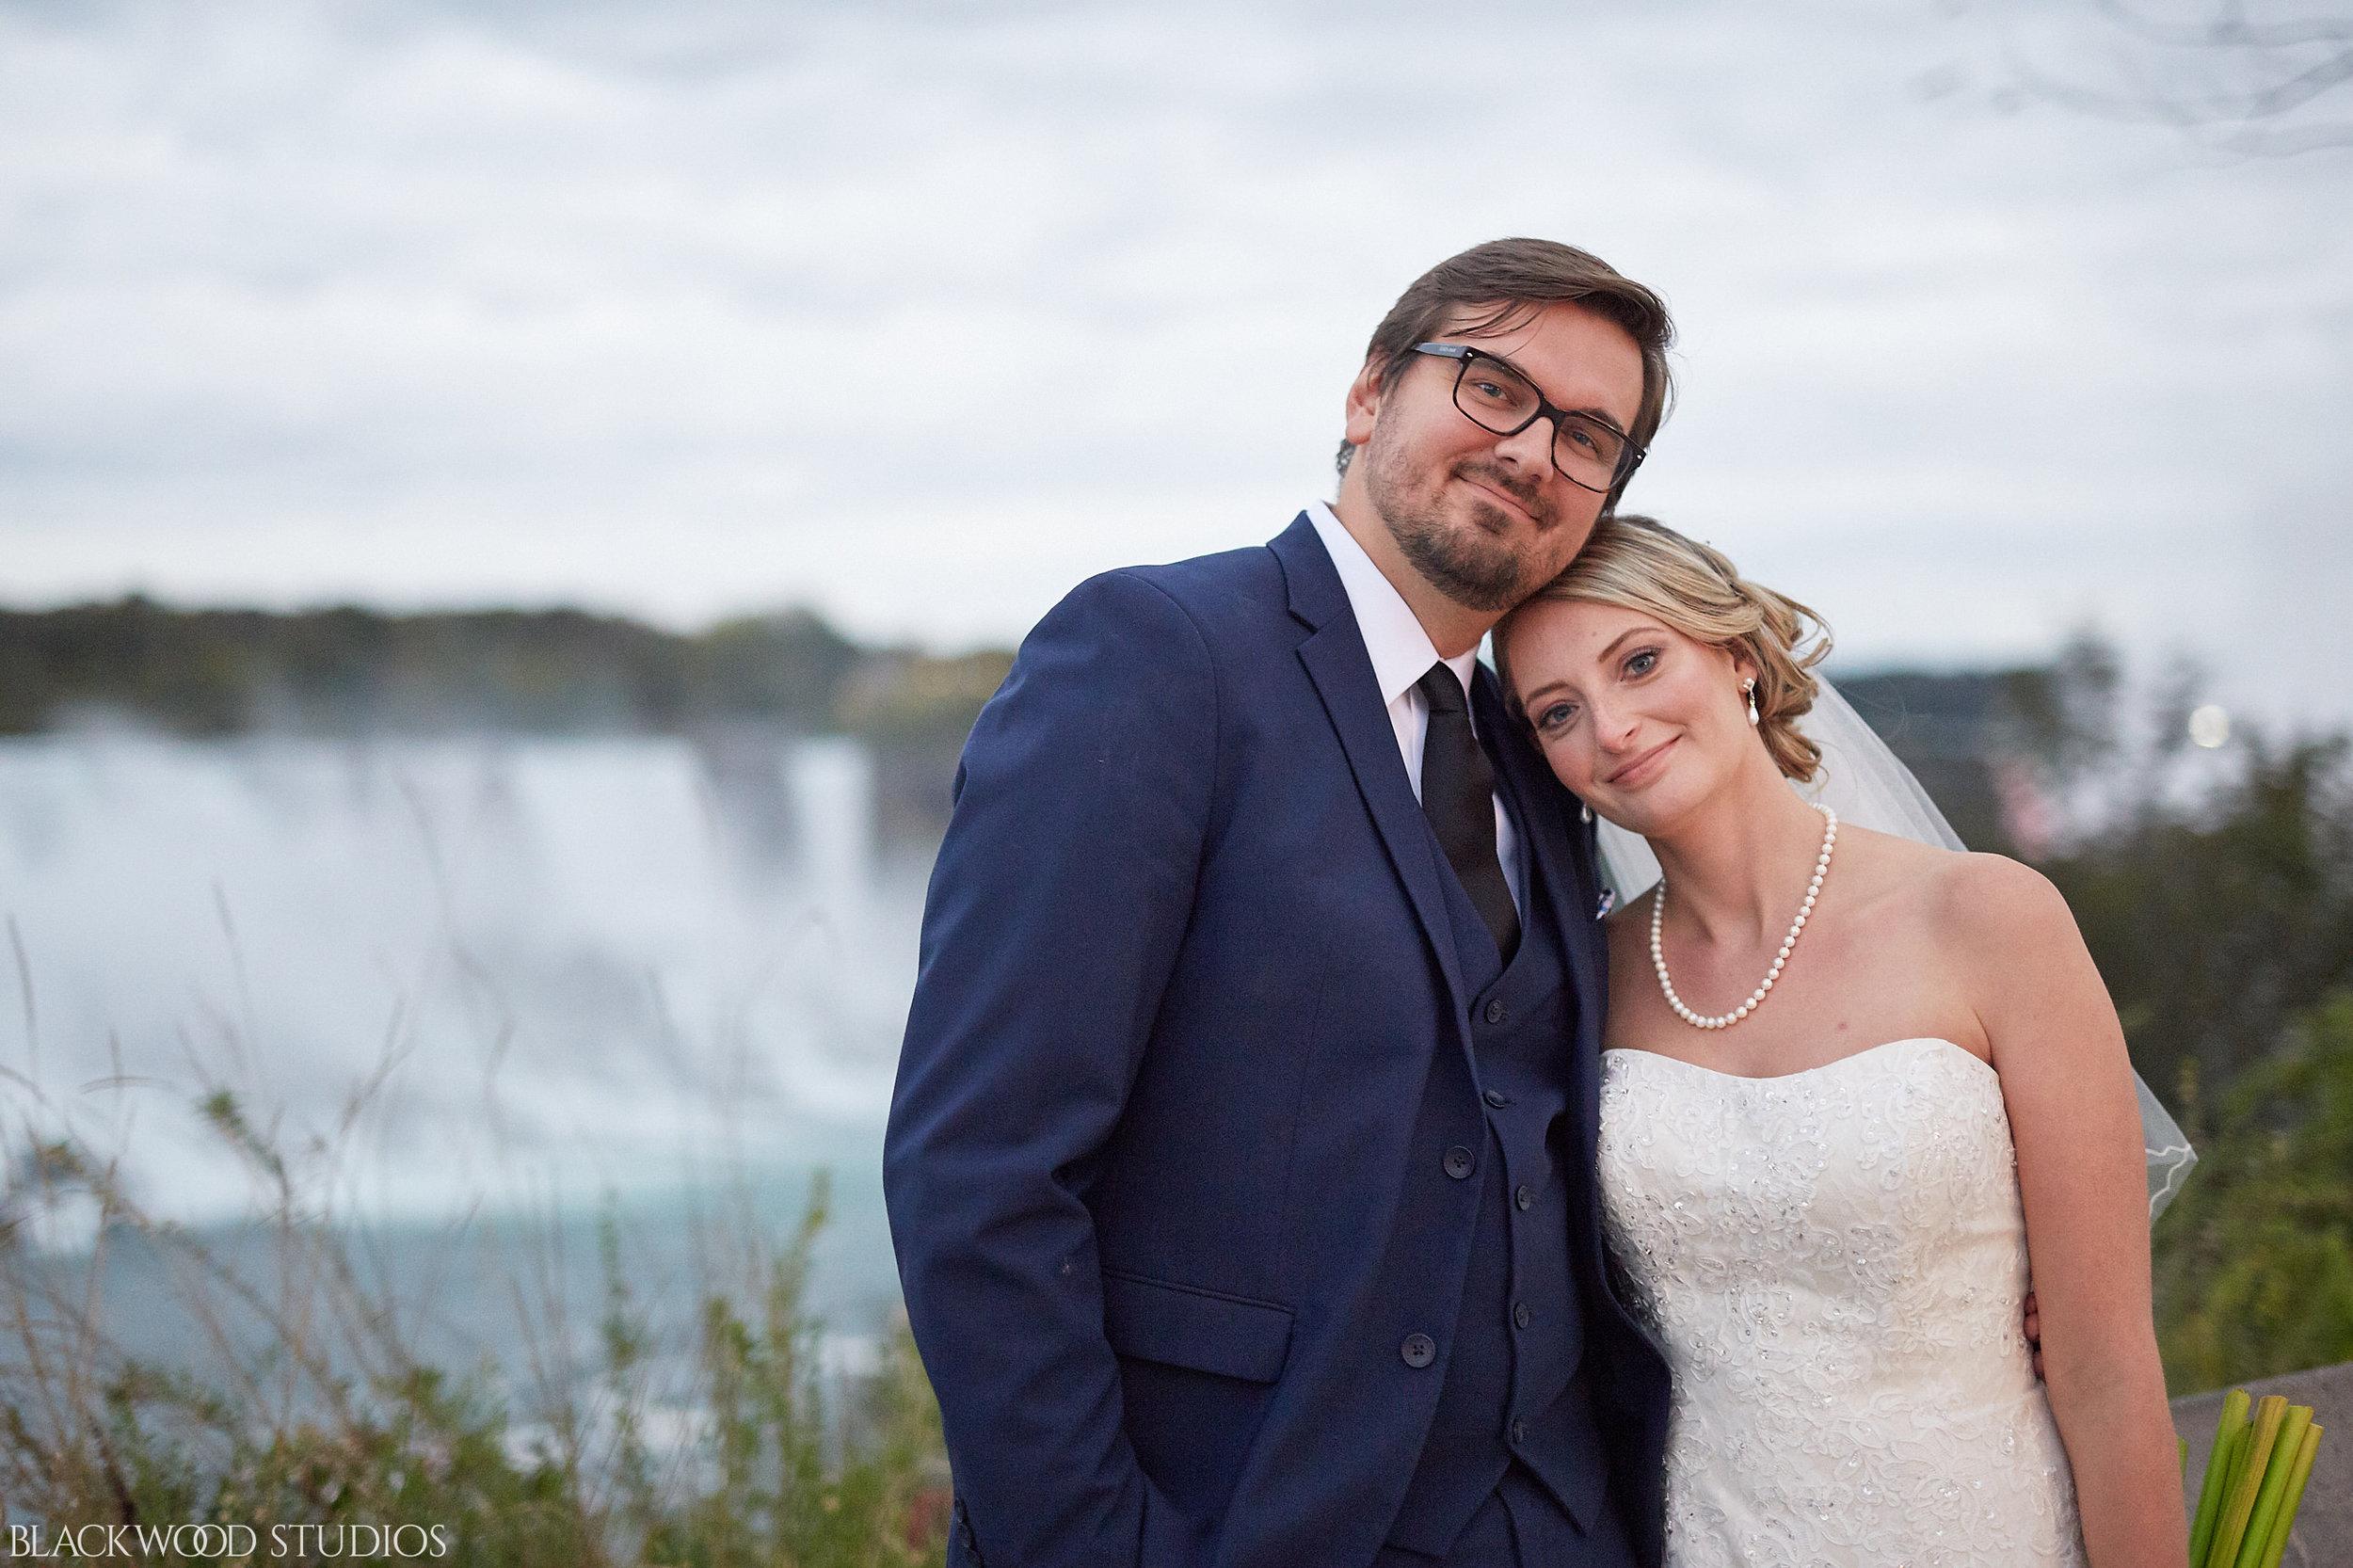 Blackwood-Studios-Wedding-Photography-20170928-191042-Marek-Katie-Michalek-Oakes-Garden-Theatre-Niagara-Falls-Ontario-Canada.jpg